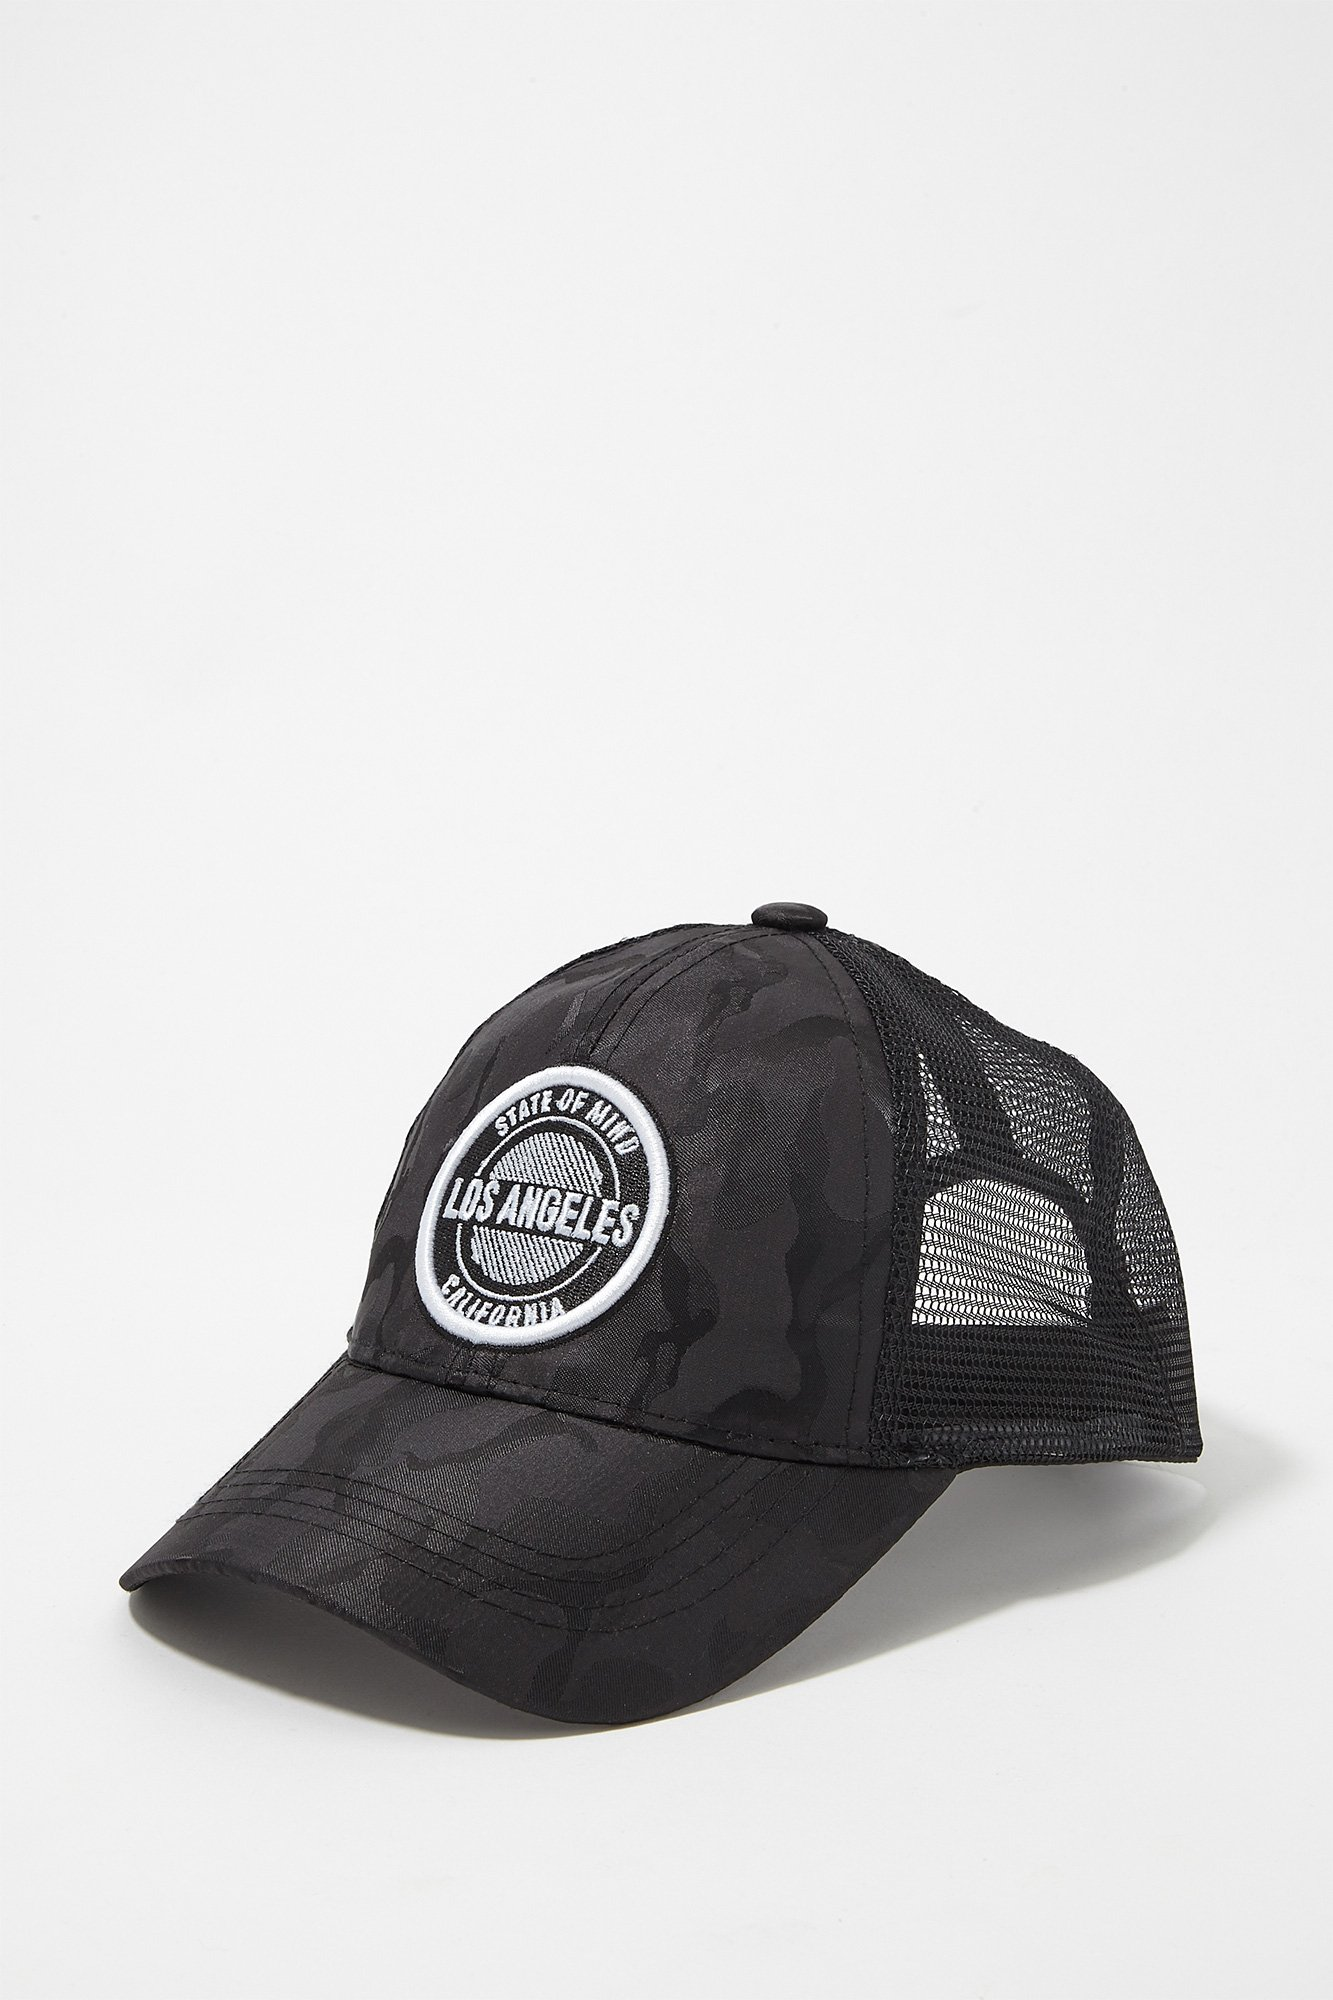 fdc9481b2d9 Urban Kids Youth Boy s Boys Camo L.A. State of Mind Snapback Baseball Hat